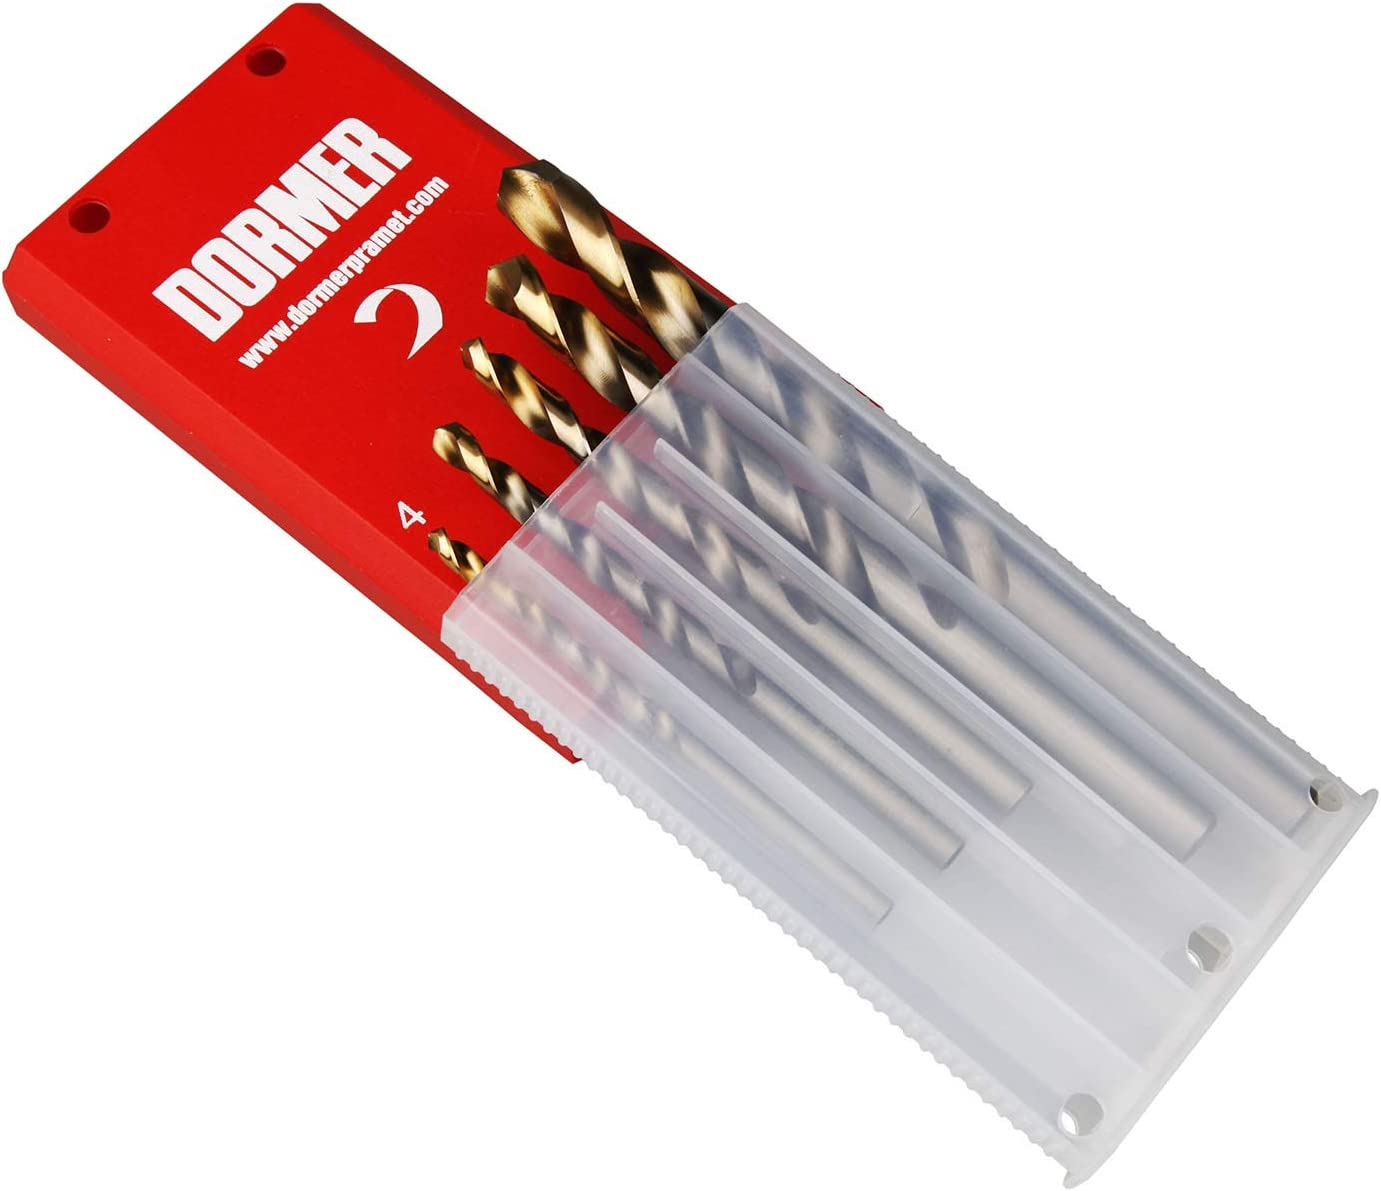 Dormer A120 HSS High Speed Steel Stub Drill Bit with 118 Degree Split Point Pack of 10 pcs